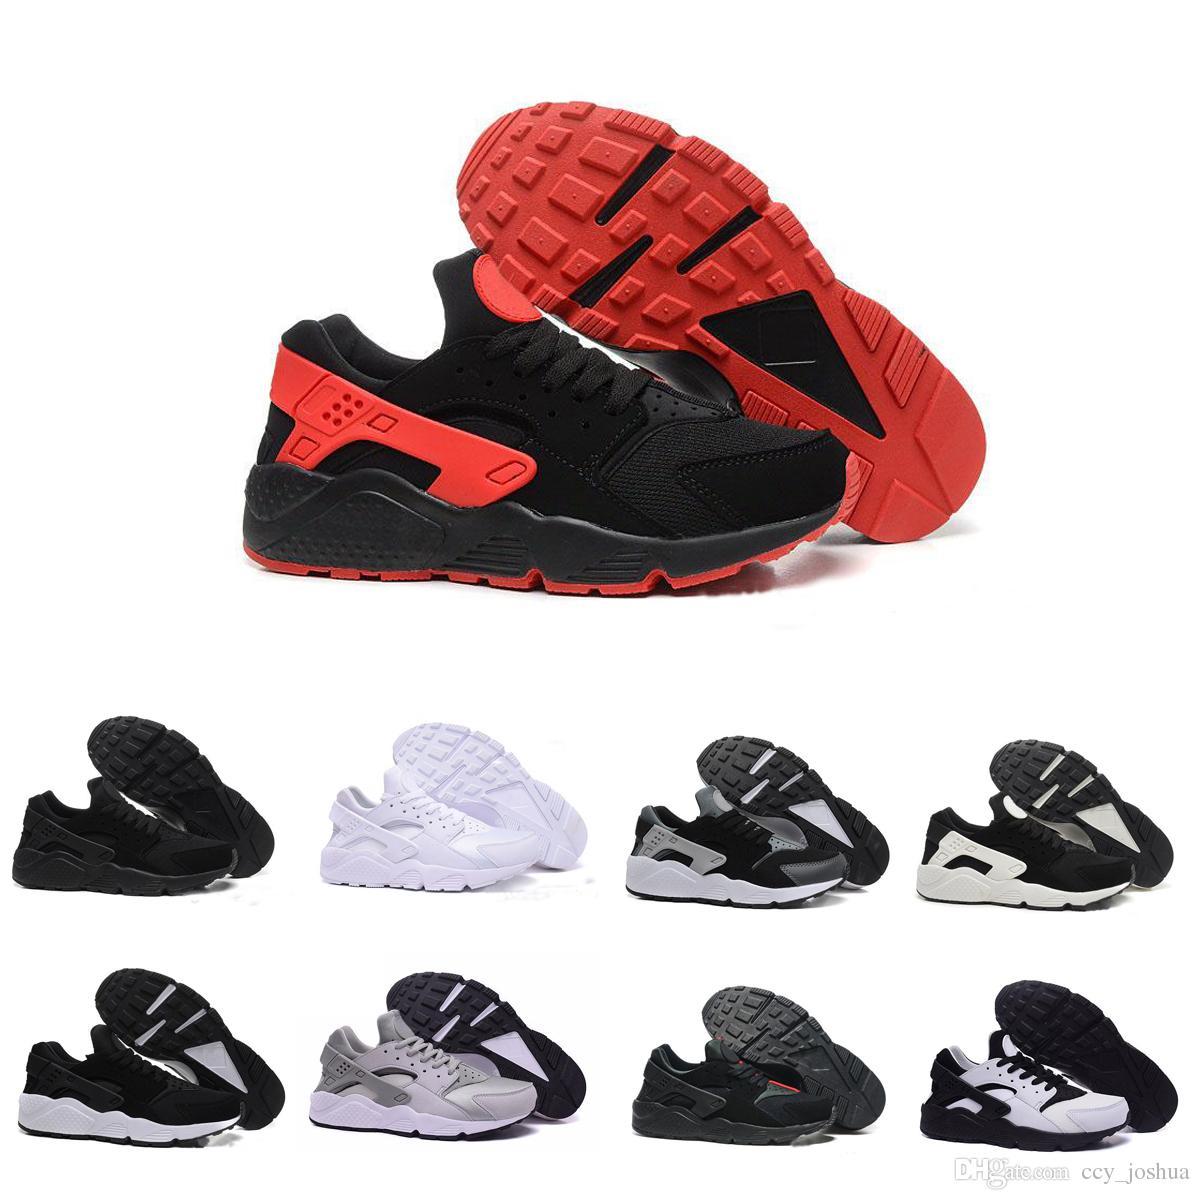 huge selection of ec6d5 b025d Acquista Nike Air Huarache 1 2 3 I Ii Iii Cheap Air Huarache 2 Ii Ultra  Classico Tutto Bianco E Nero Huaraches Scarpe Uomo Donna Sneakers Scarpe Da  Corsa ...